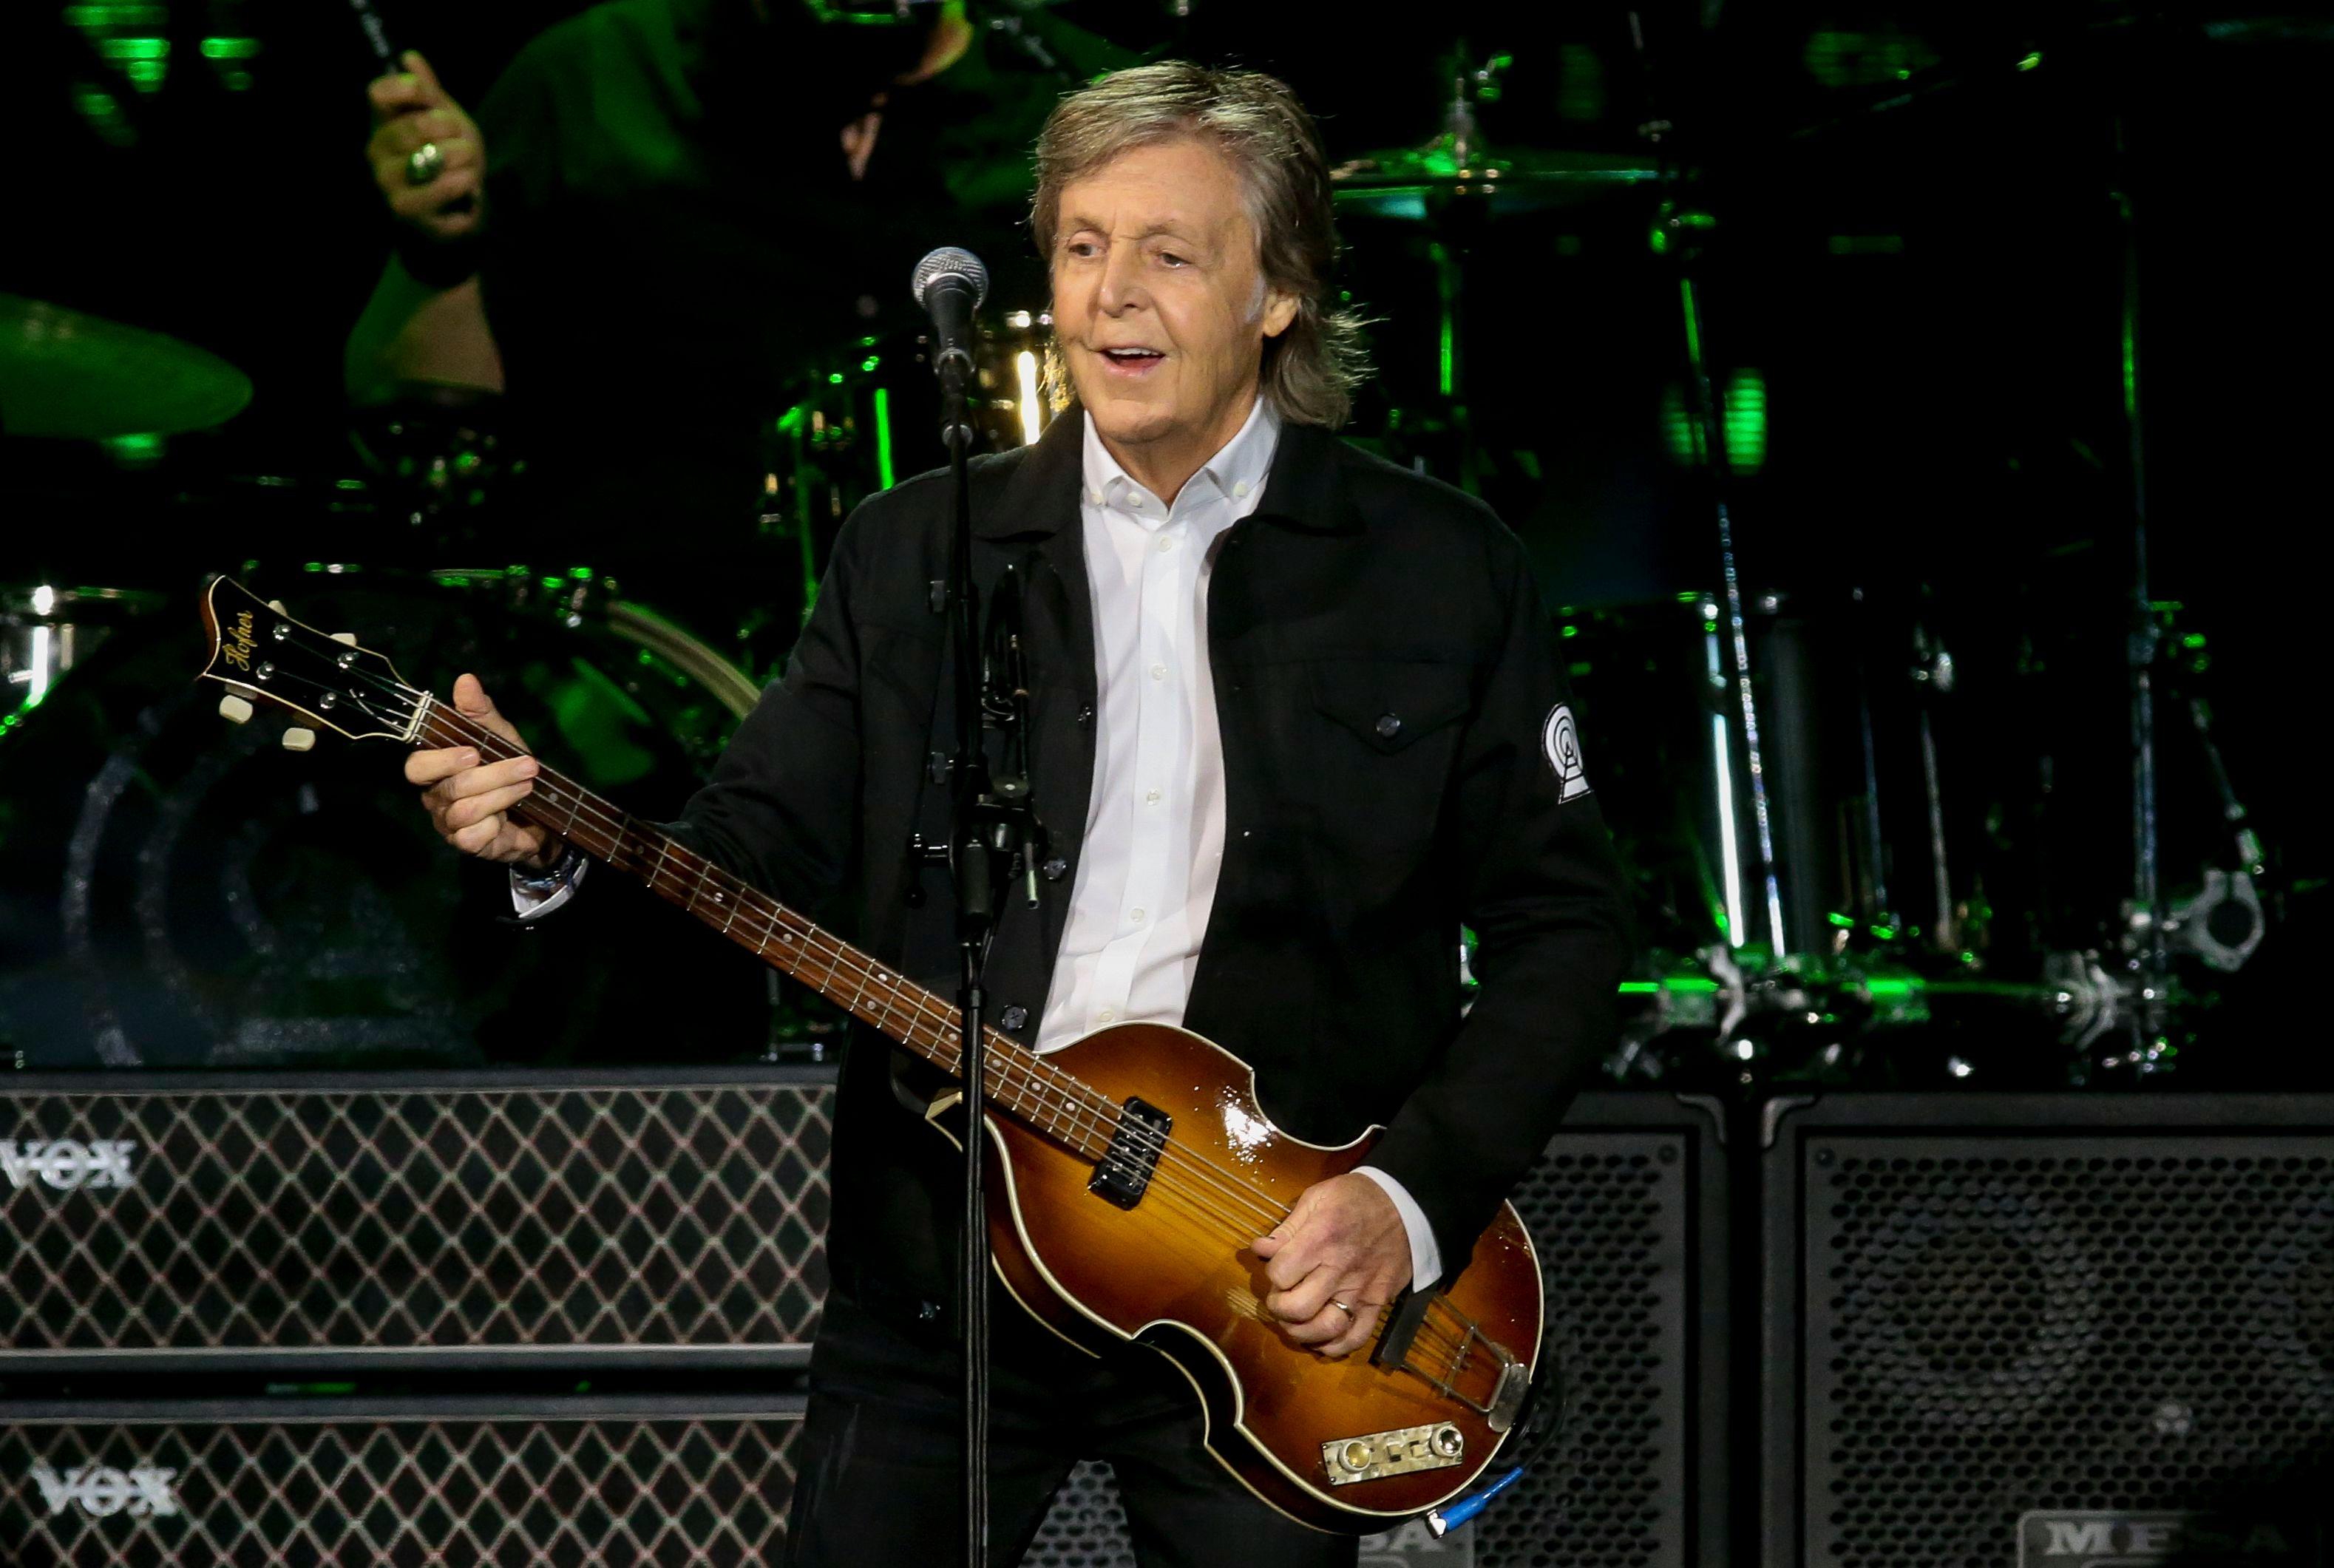 Paul McCartney Writing Musical Version of 'It's a Wonderful Life'